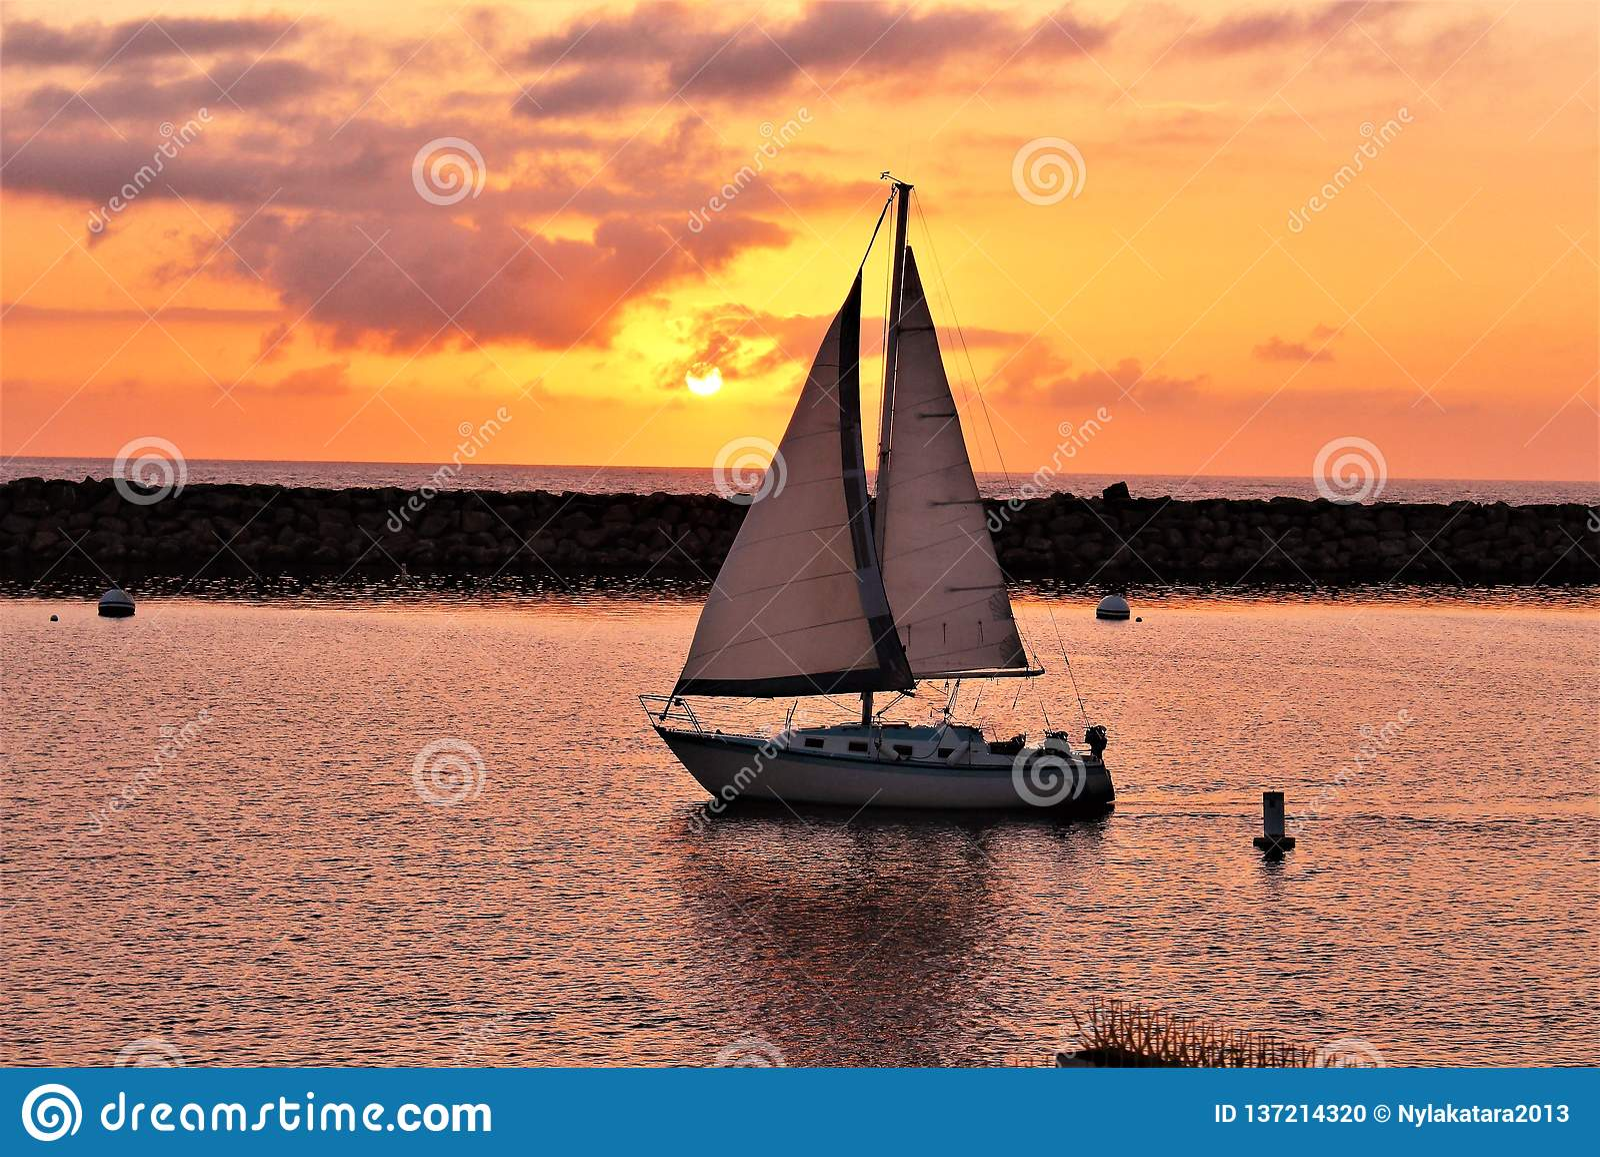 Portifino加利福尼亚海洋边日落在雷东多海滩,加利福尼亚,美国